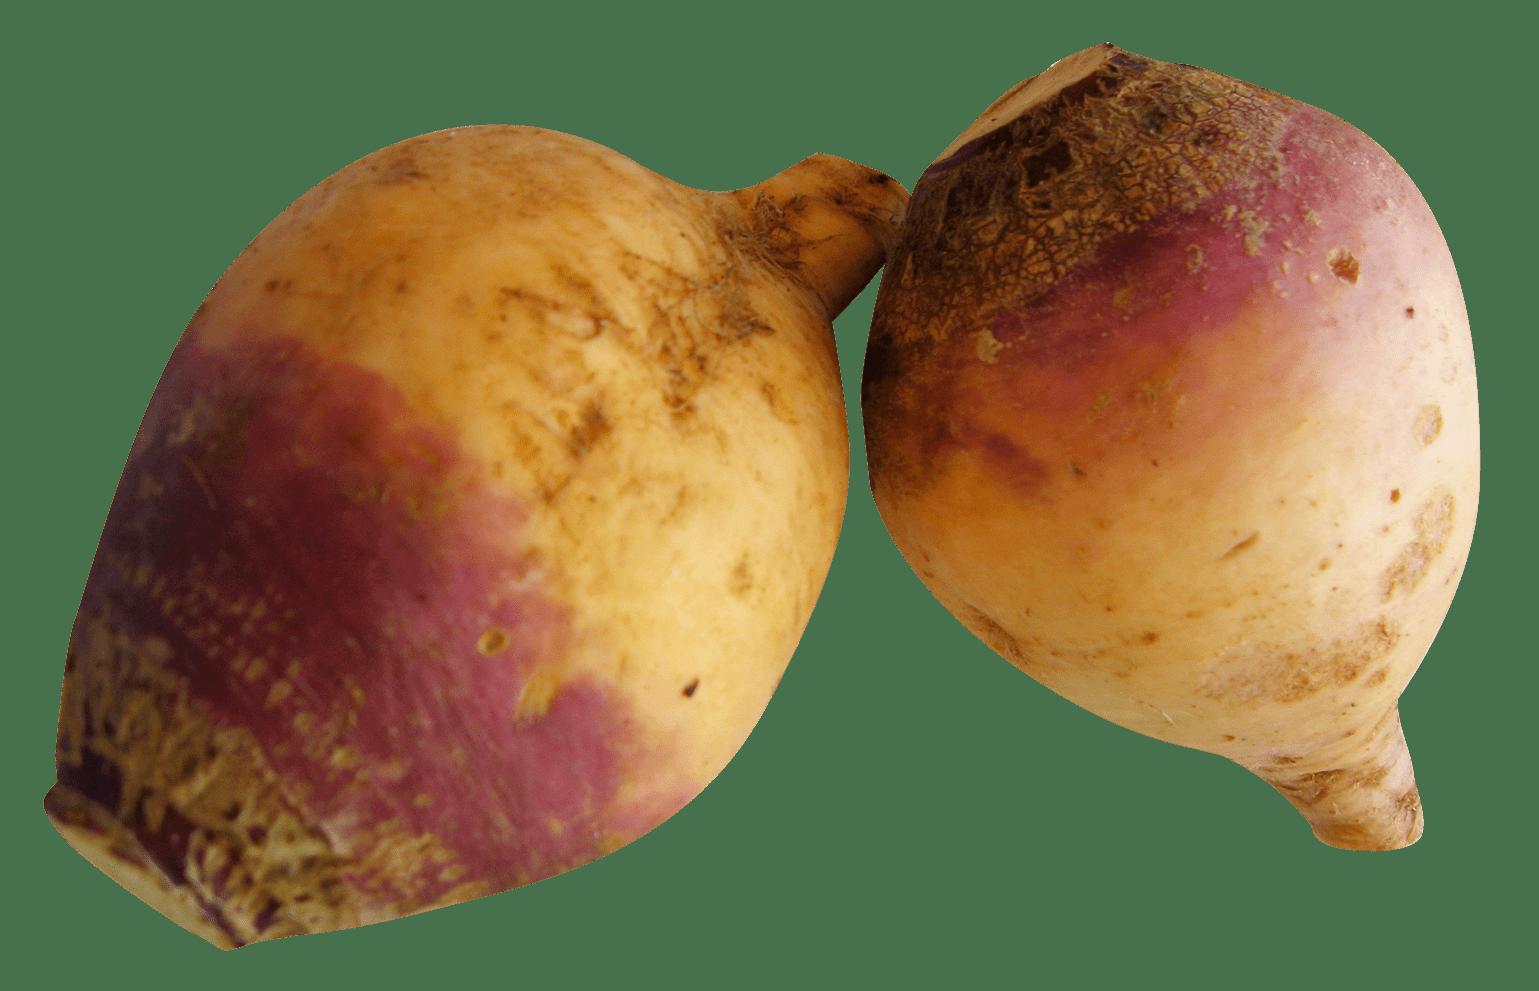 Vegetables clipart turnip. Rutabaga transparent png stickpng